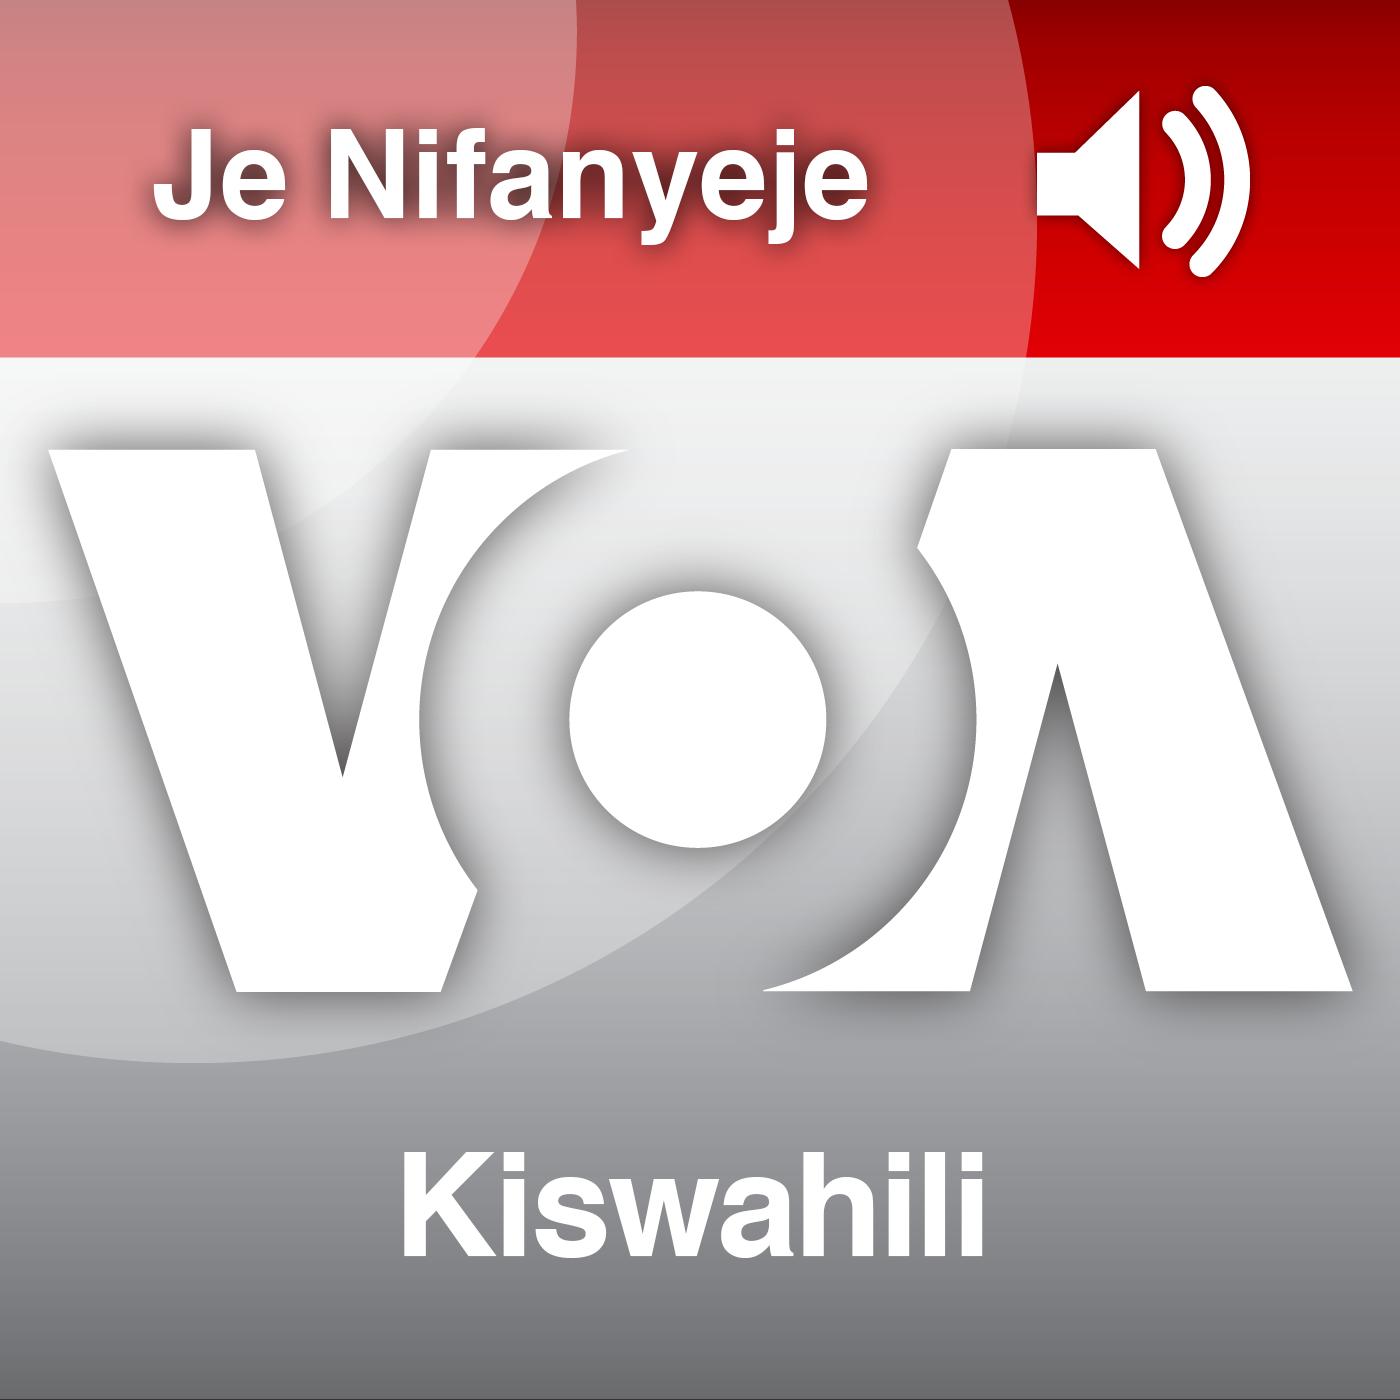 Je Nifanyeje?  - Voice of America